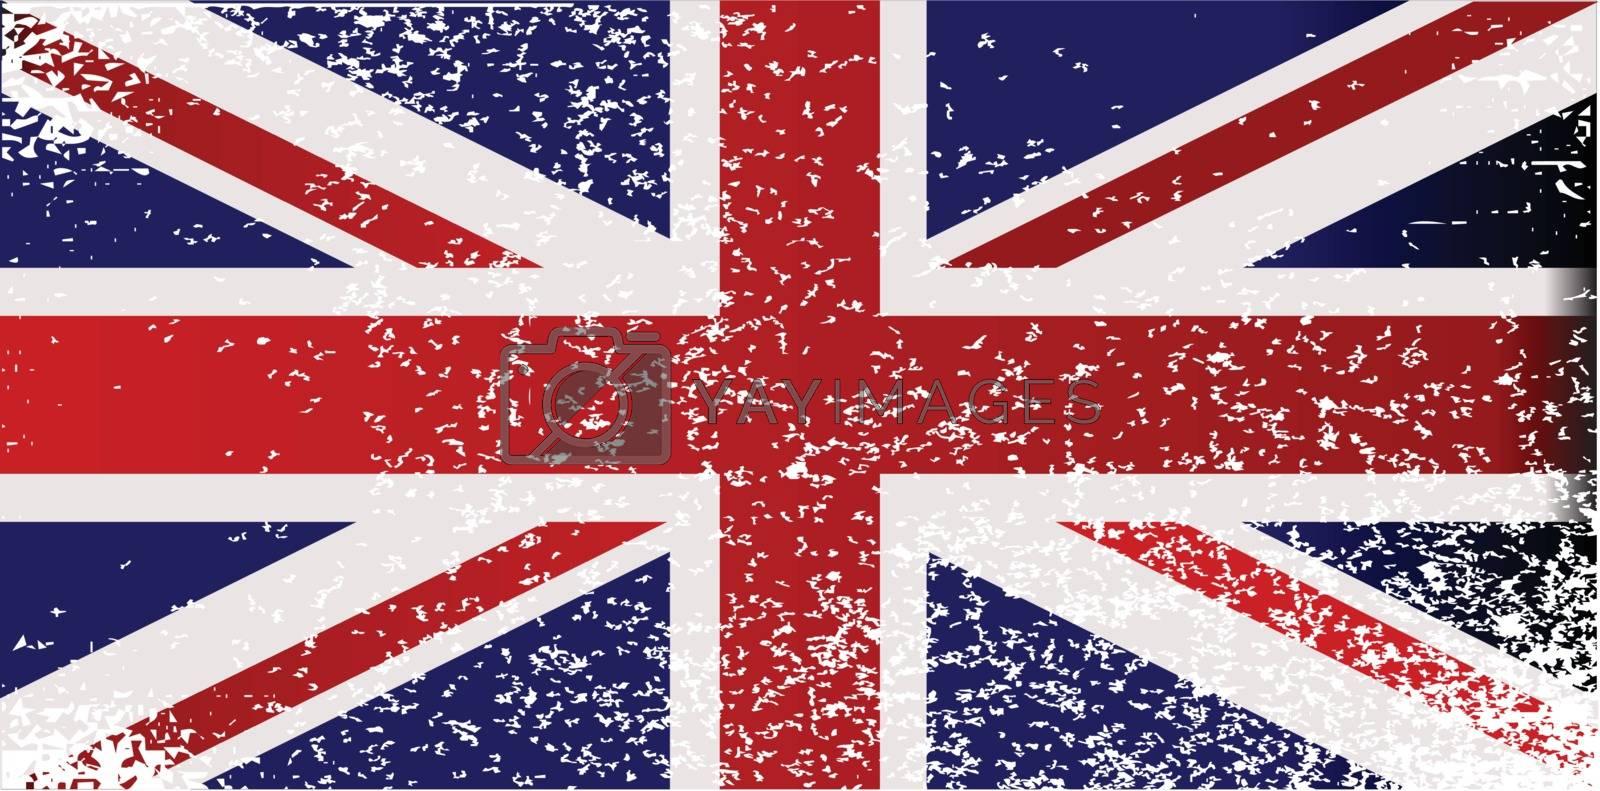 A silhouette of the United Kingdom set over a union flag.